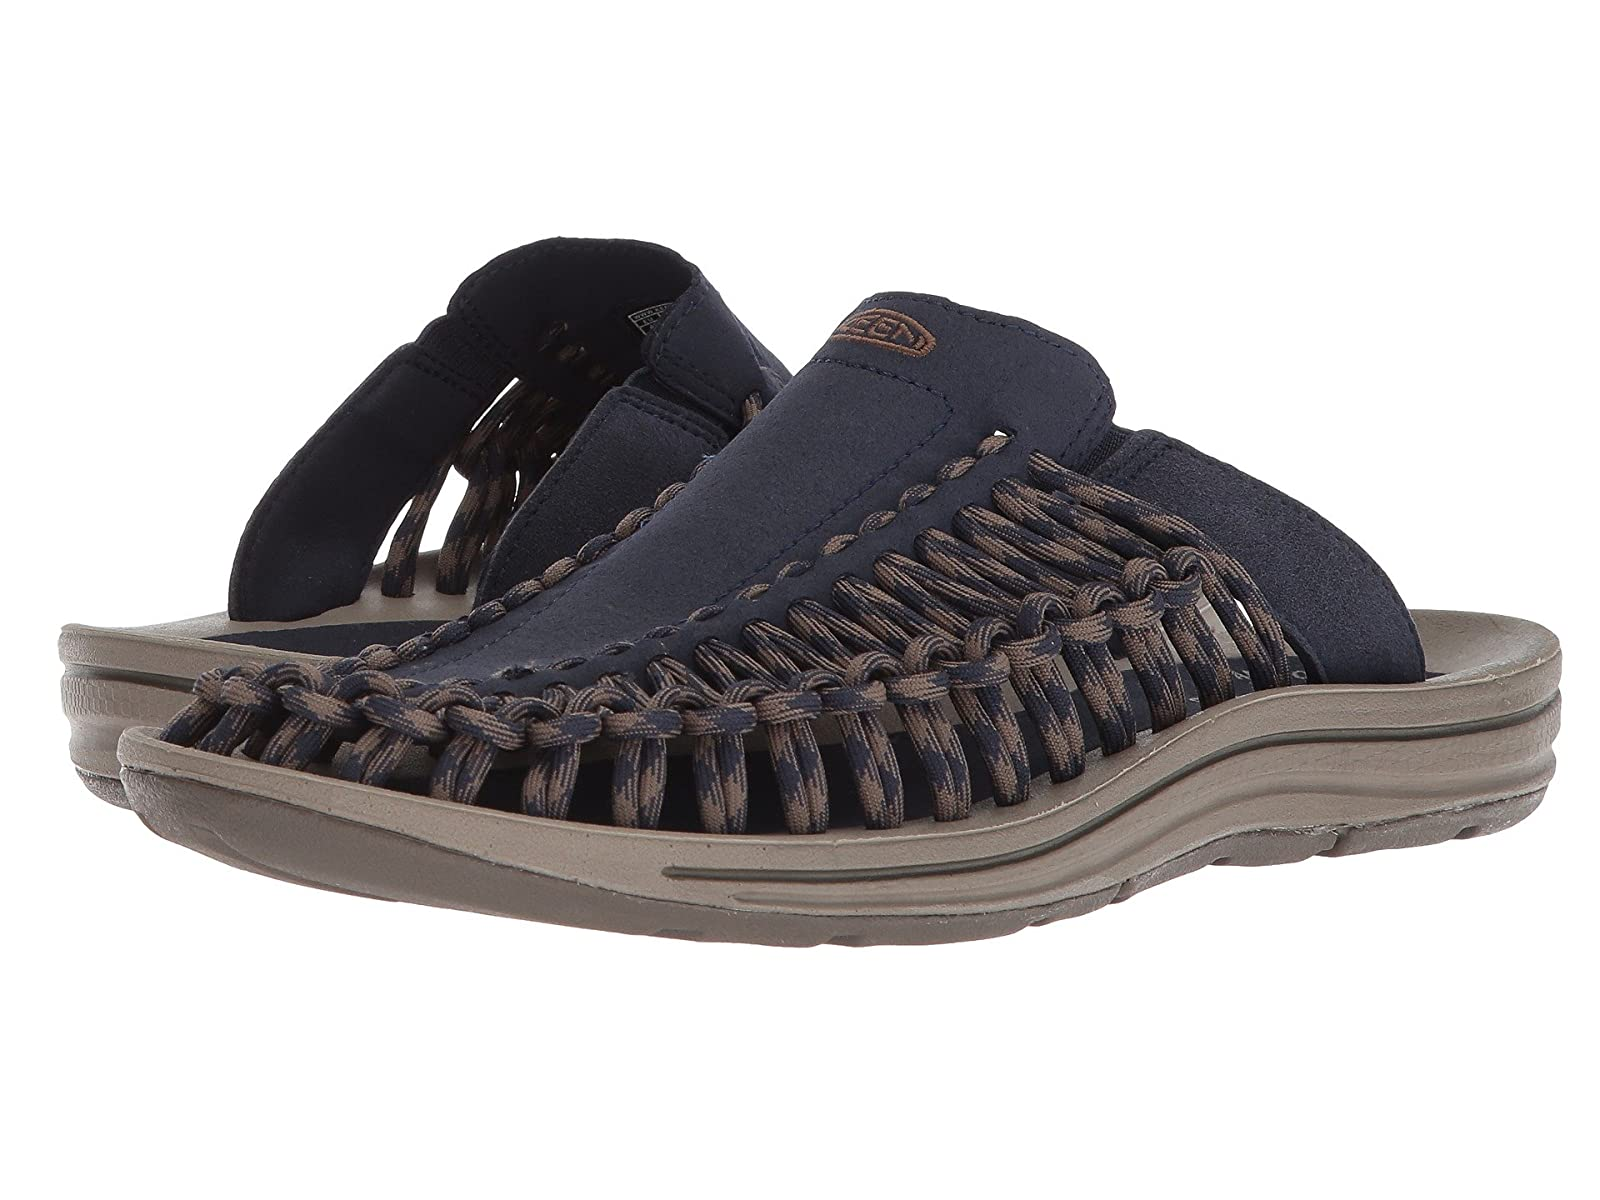 Keen Uneek SlideAtmospheric grades have affordable shoes